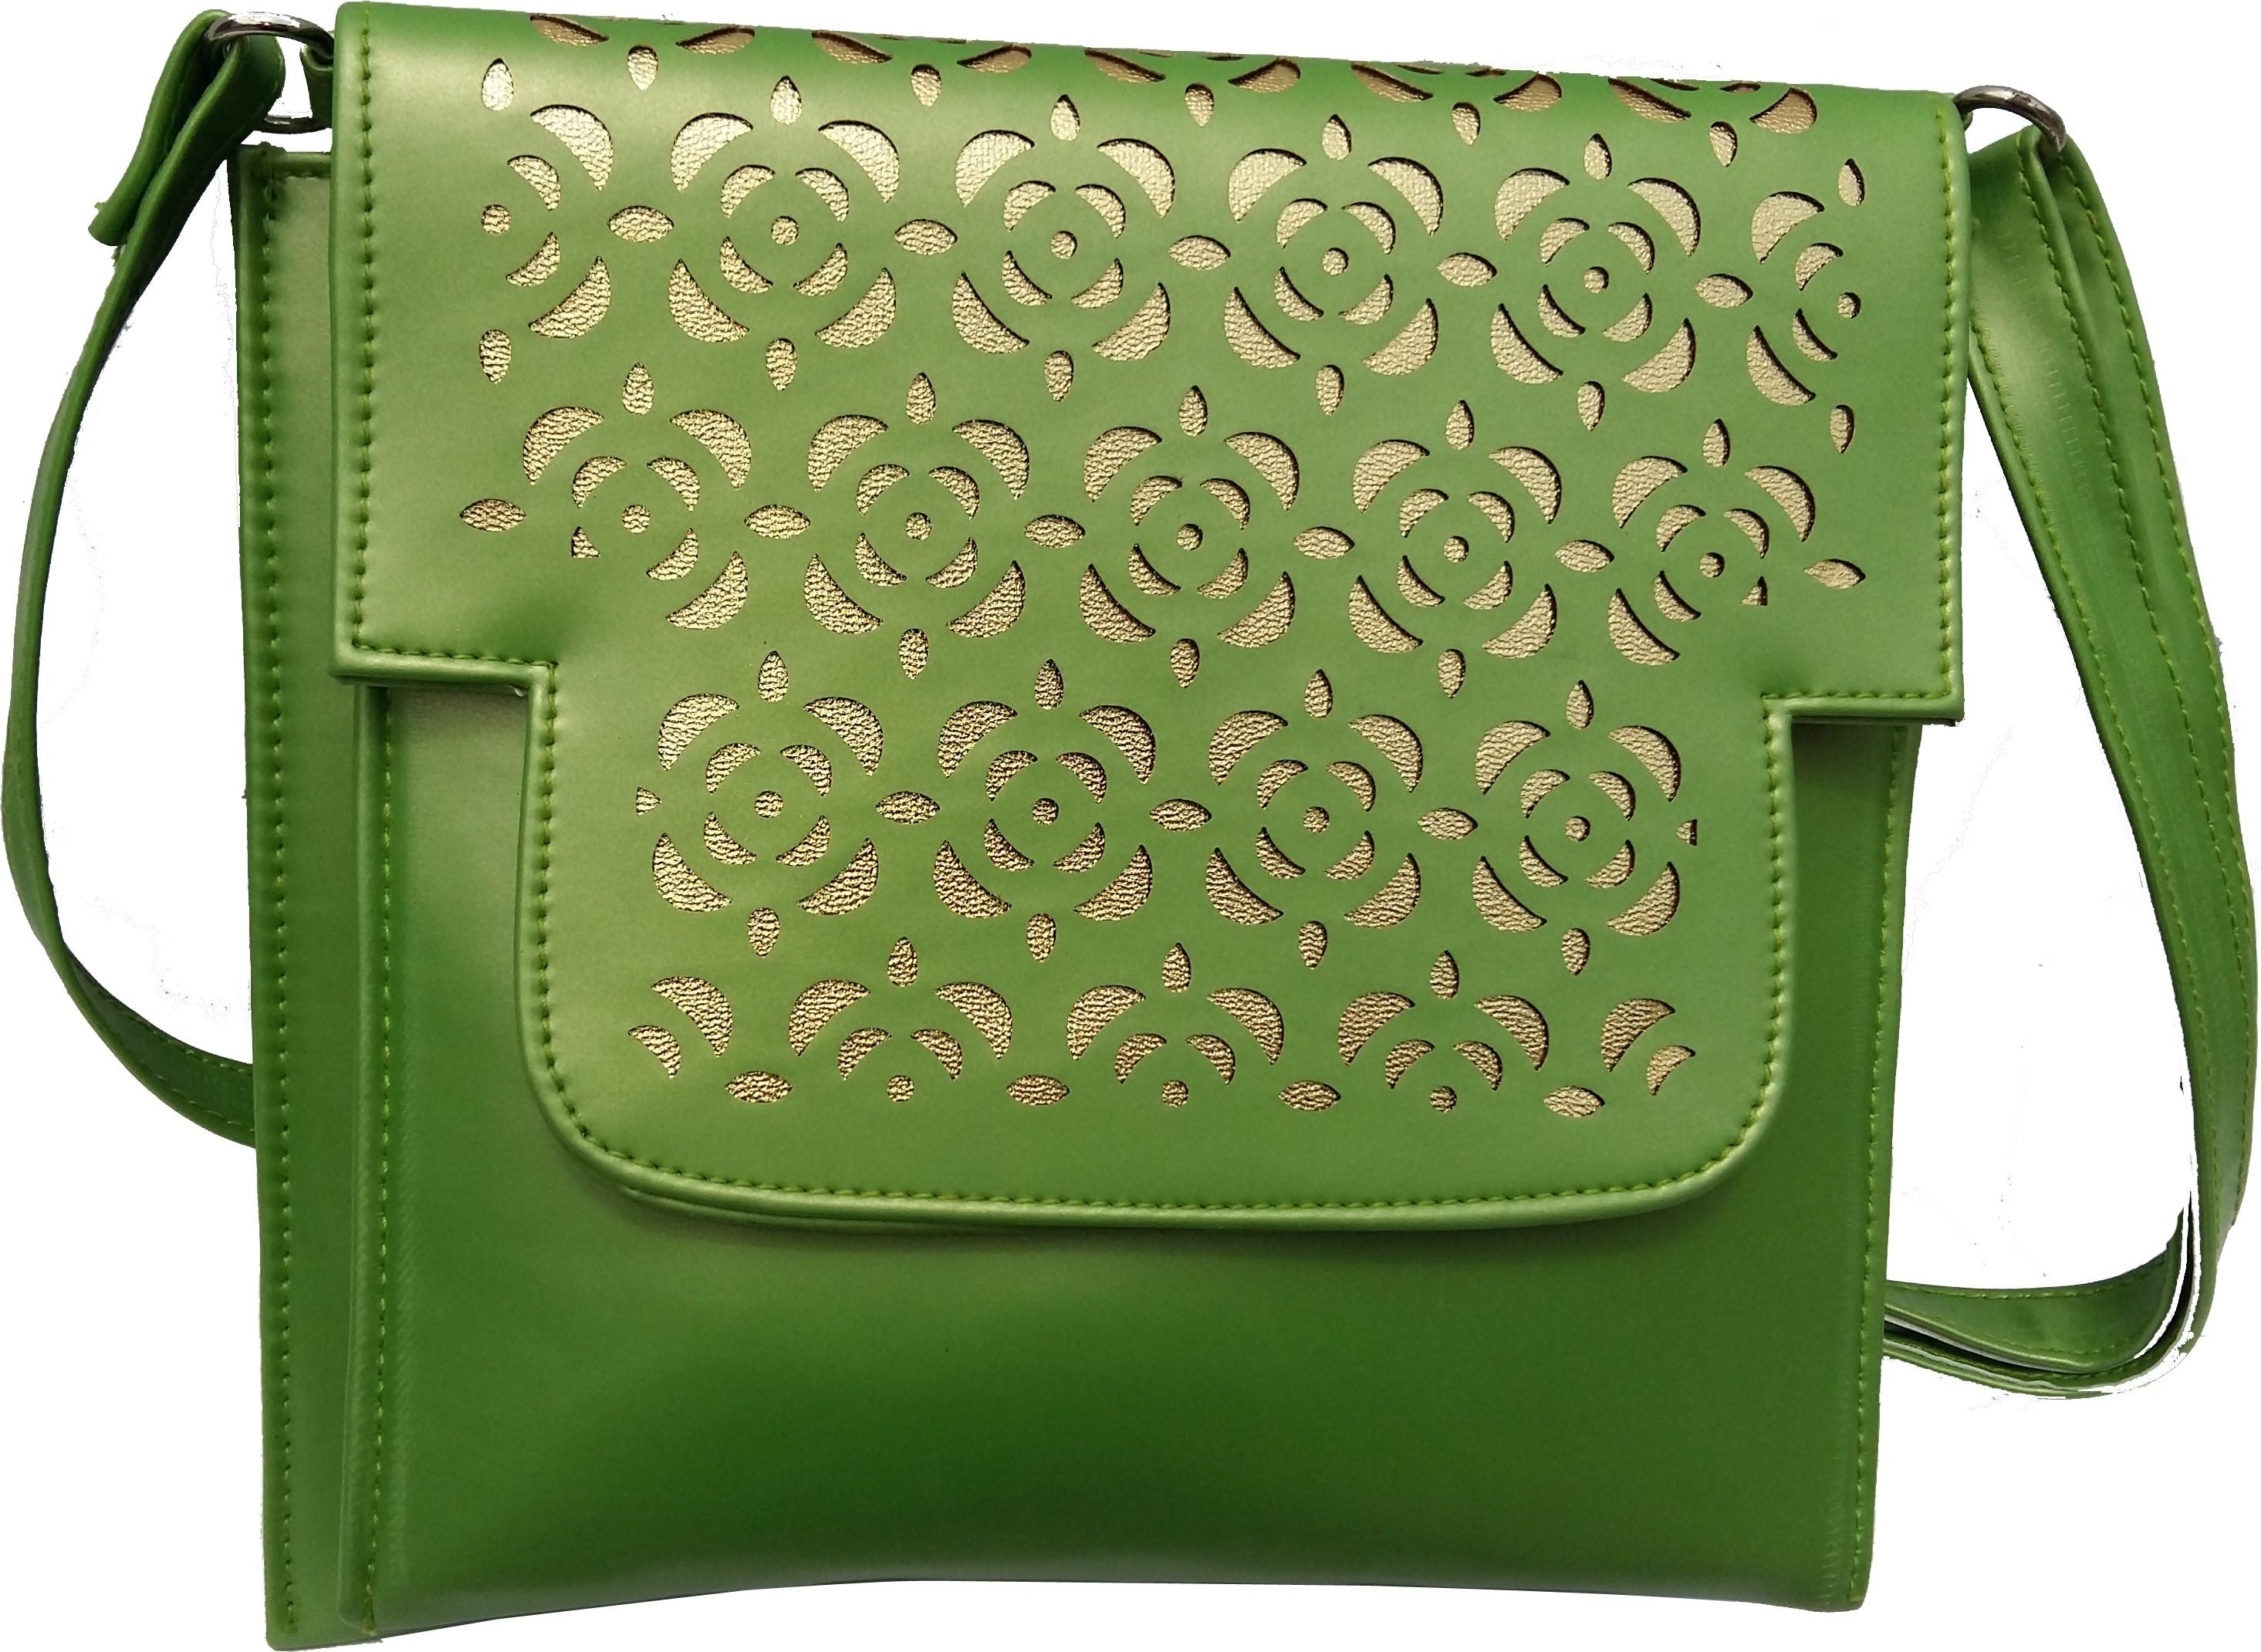 Sling bag below 500 - Surmount Girls Women Green Pu Sling Bag